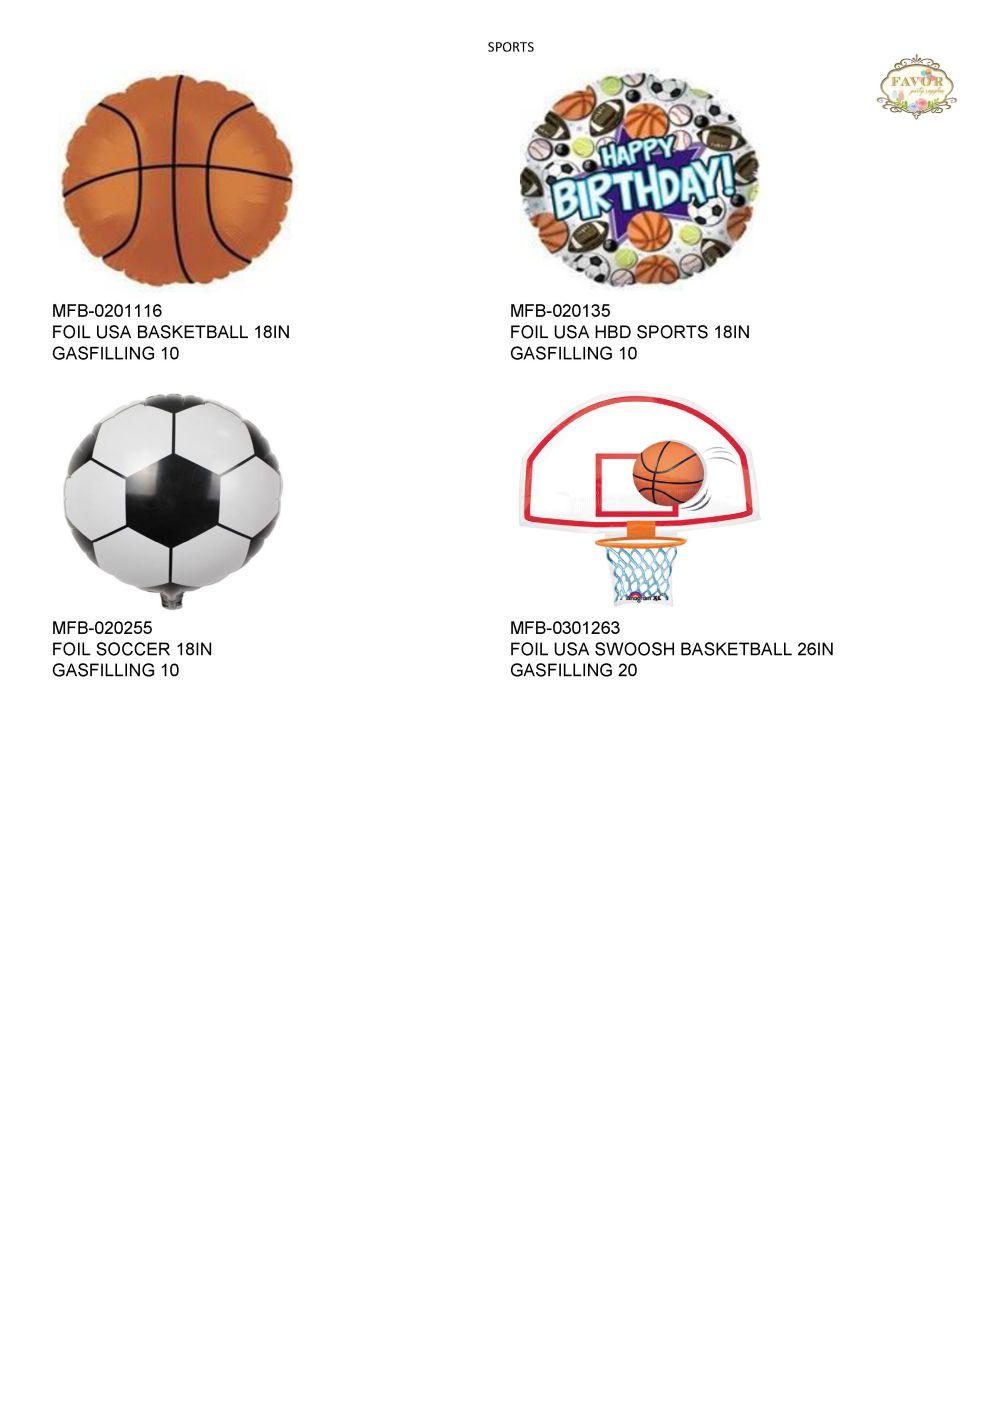 katalog-sports